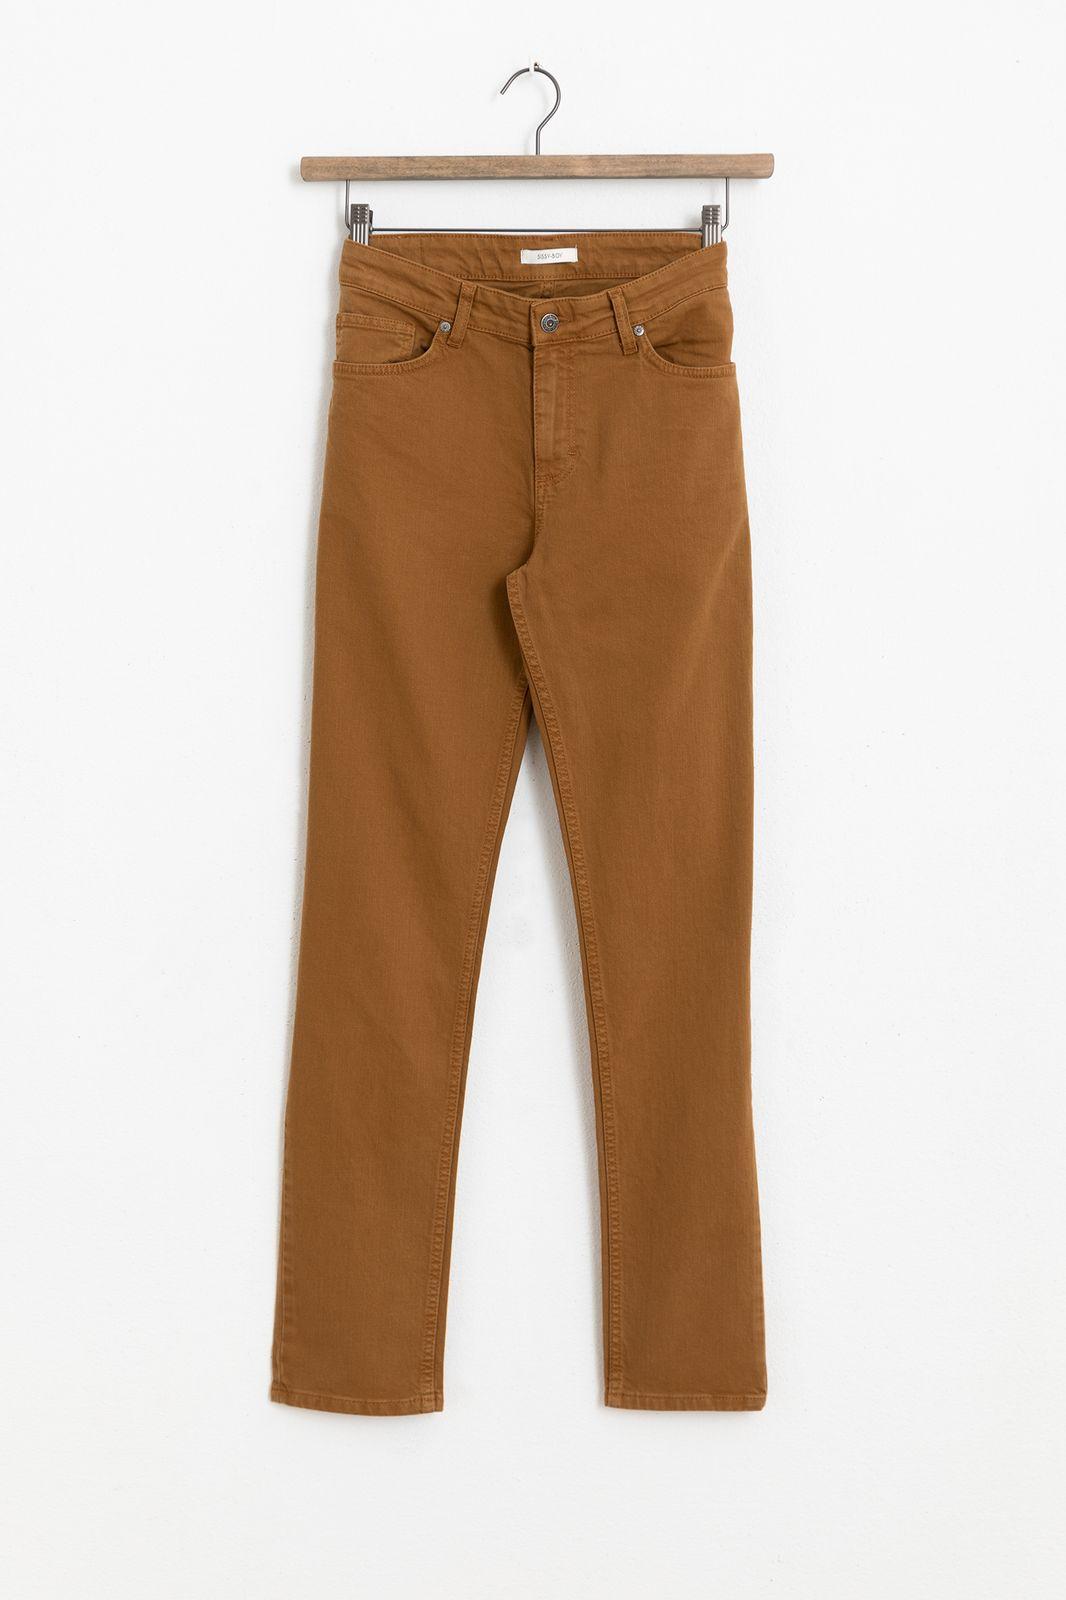 Bruine twill jeans - Heren | Sissy-Boy